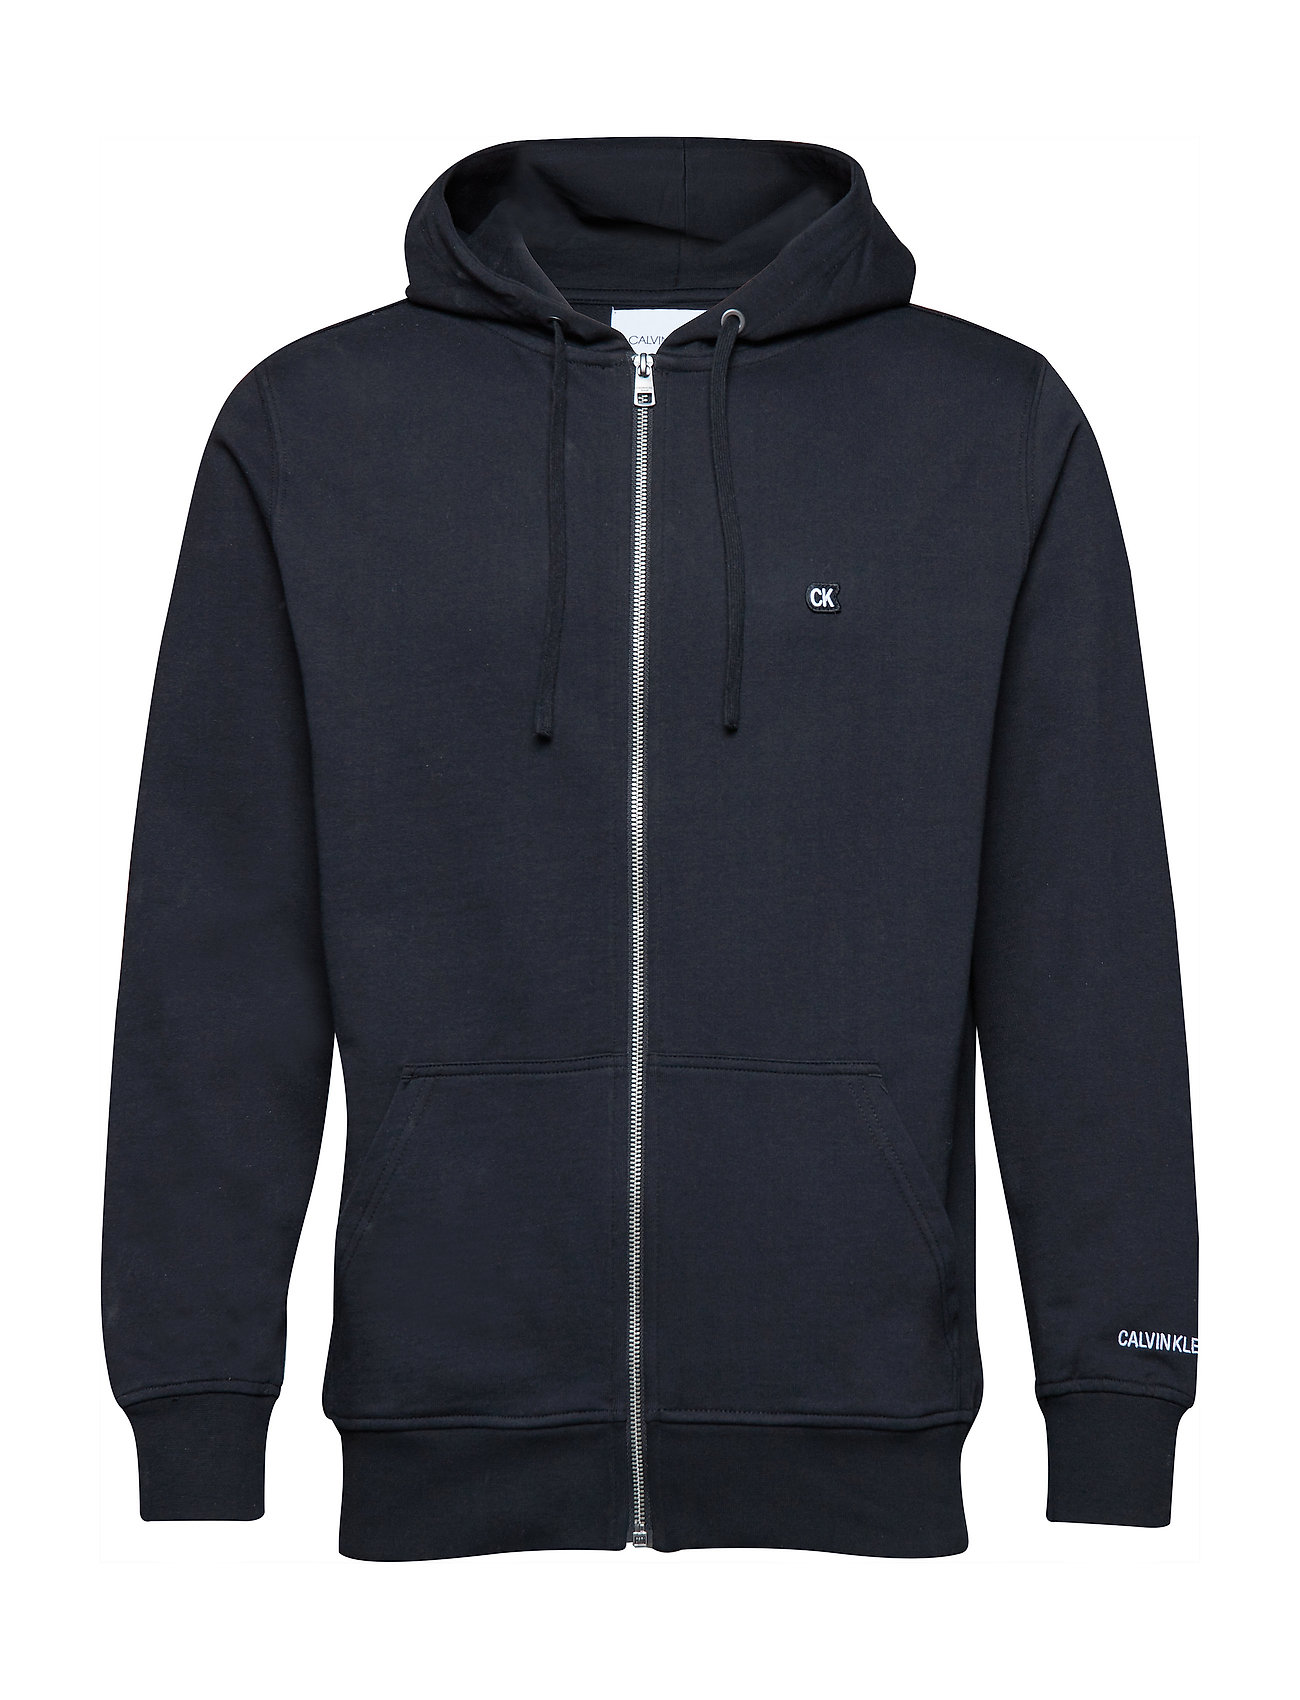 BlackCalvin Klein Zip Jeans Ckj Up09ck Embro BoQrxWdCe